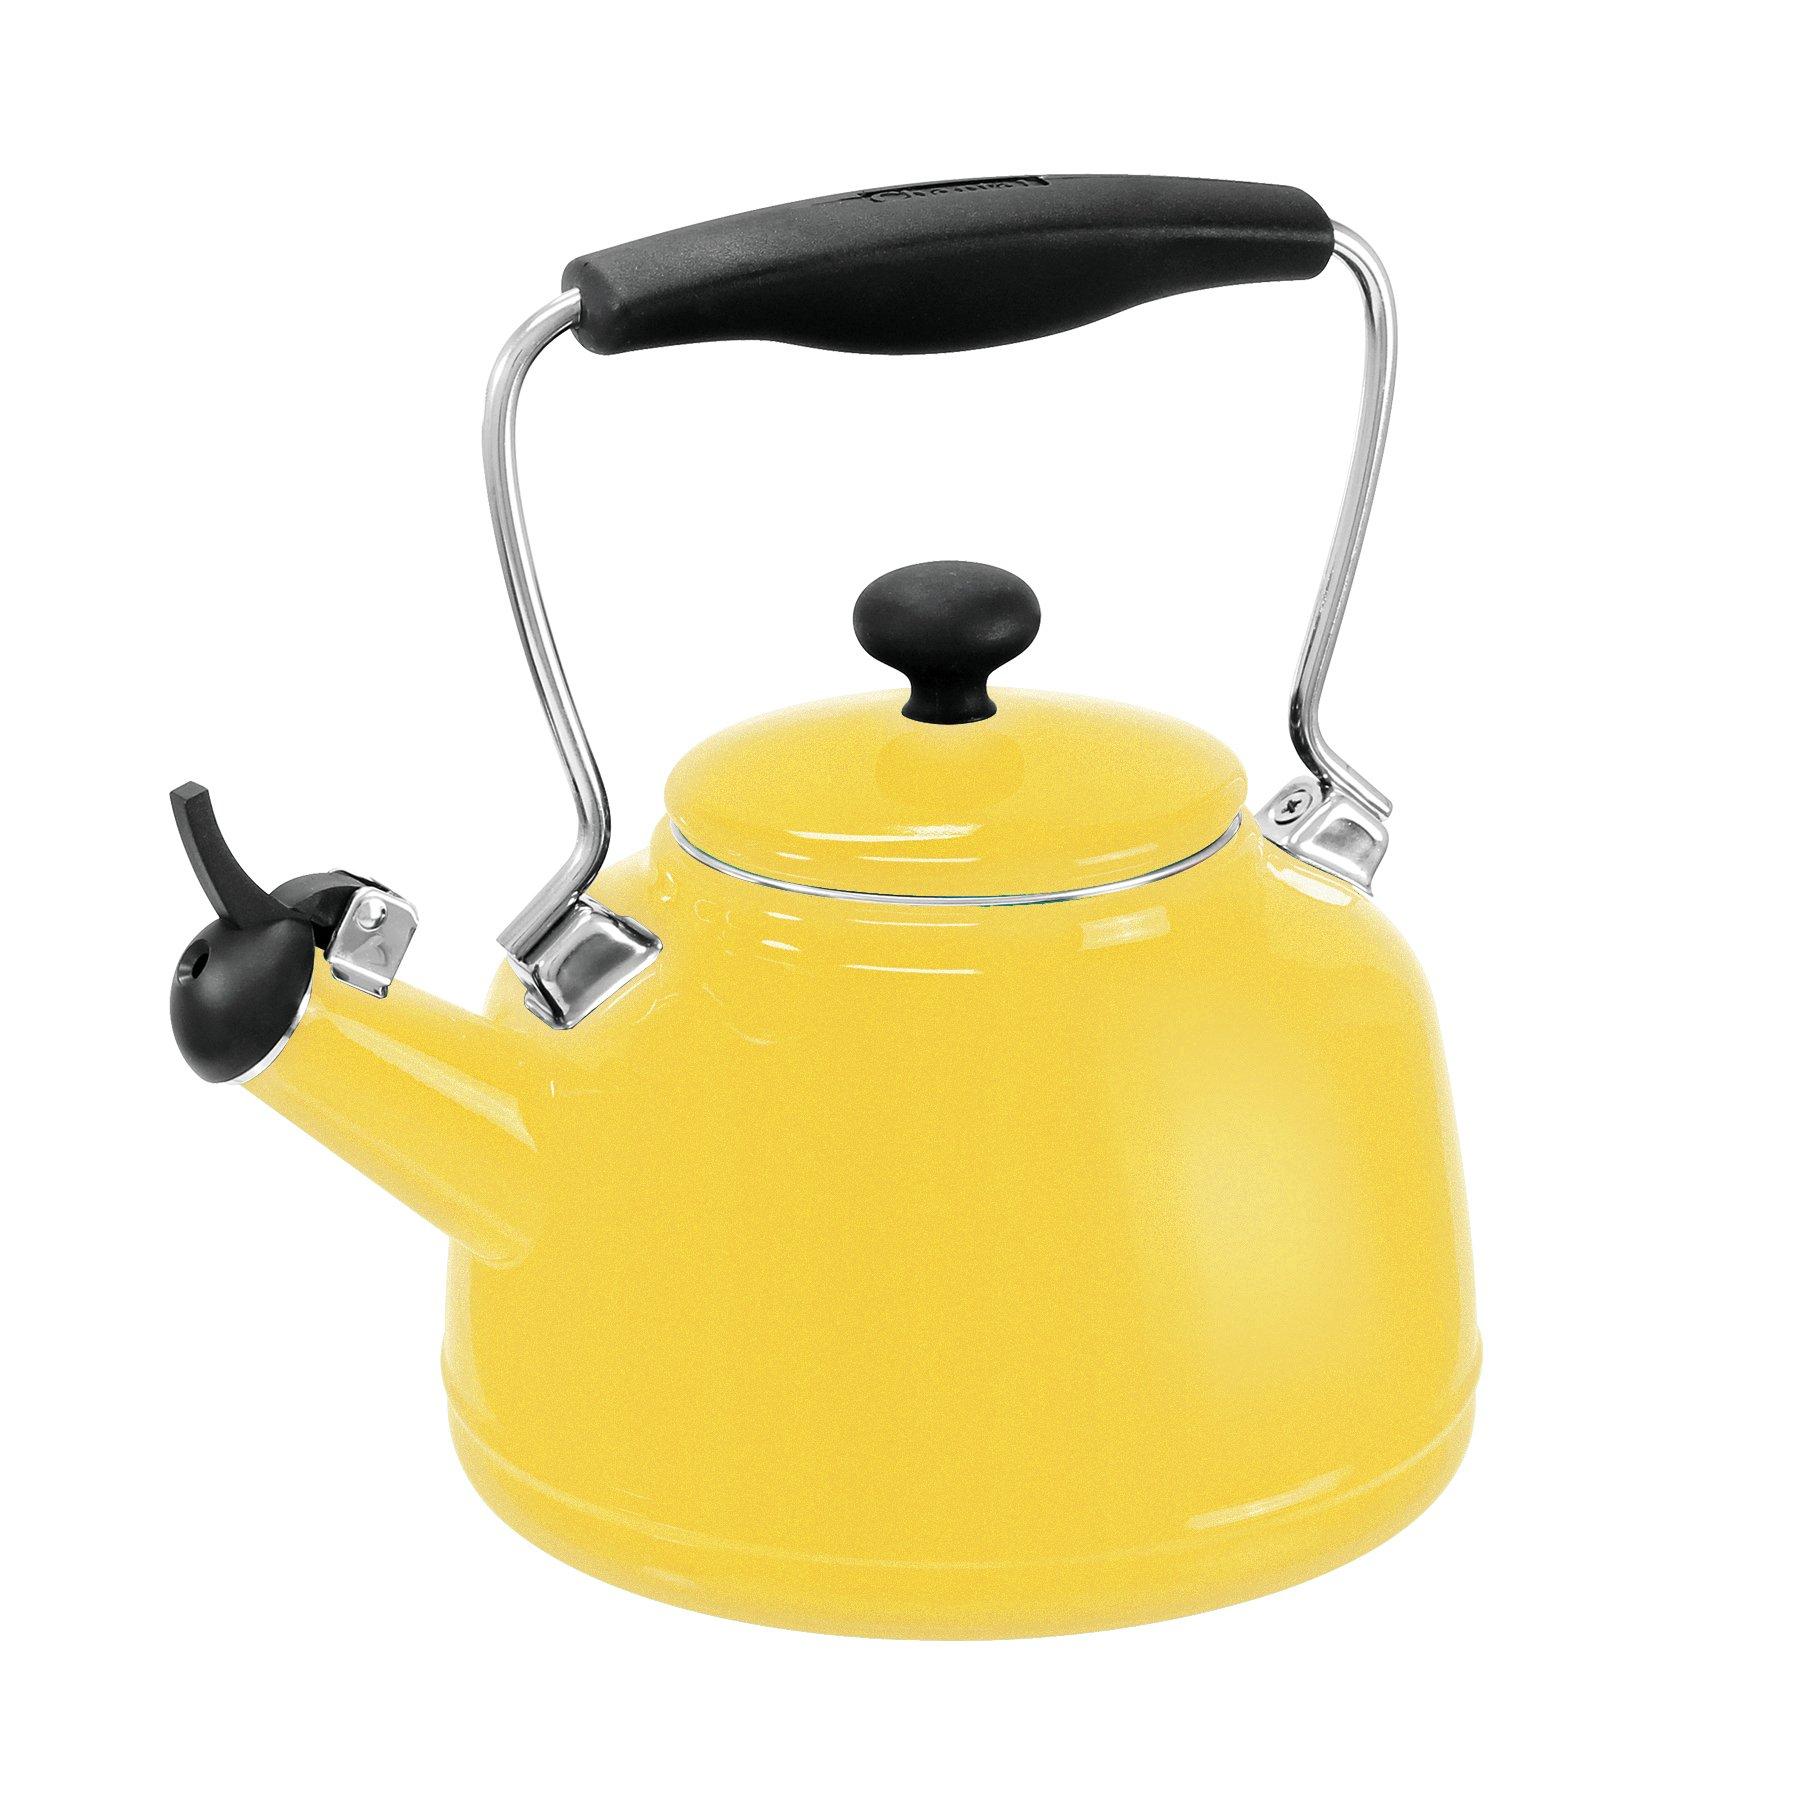 Chantal 37-VINT YC Enamel on Steel Vintage Teakettle, 1.7 quart, Canary Yellow